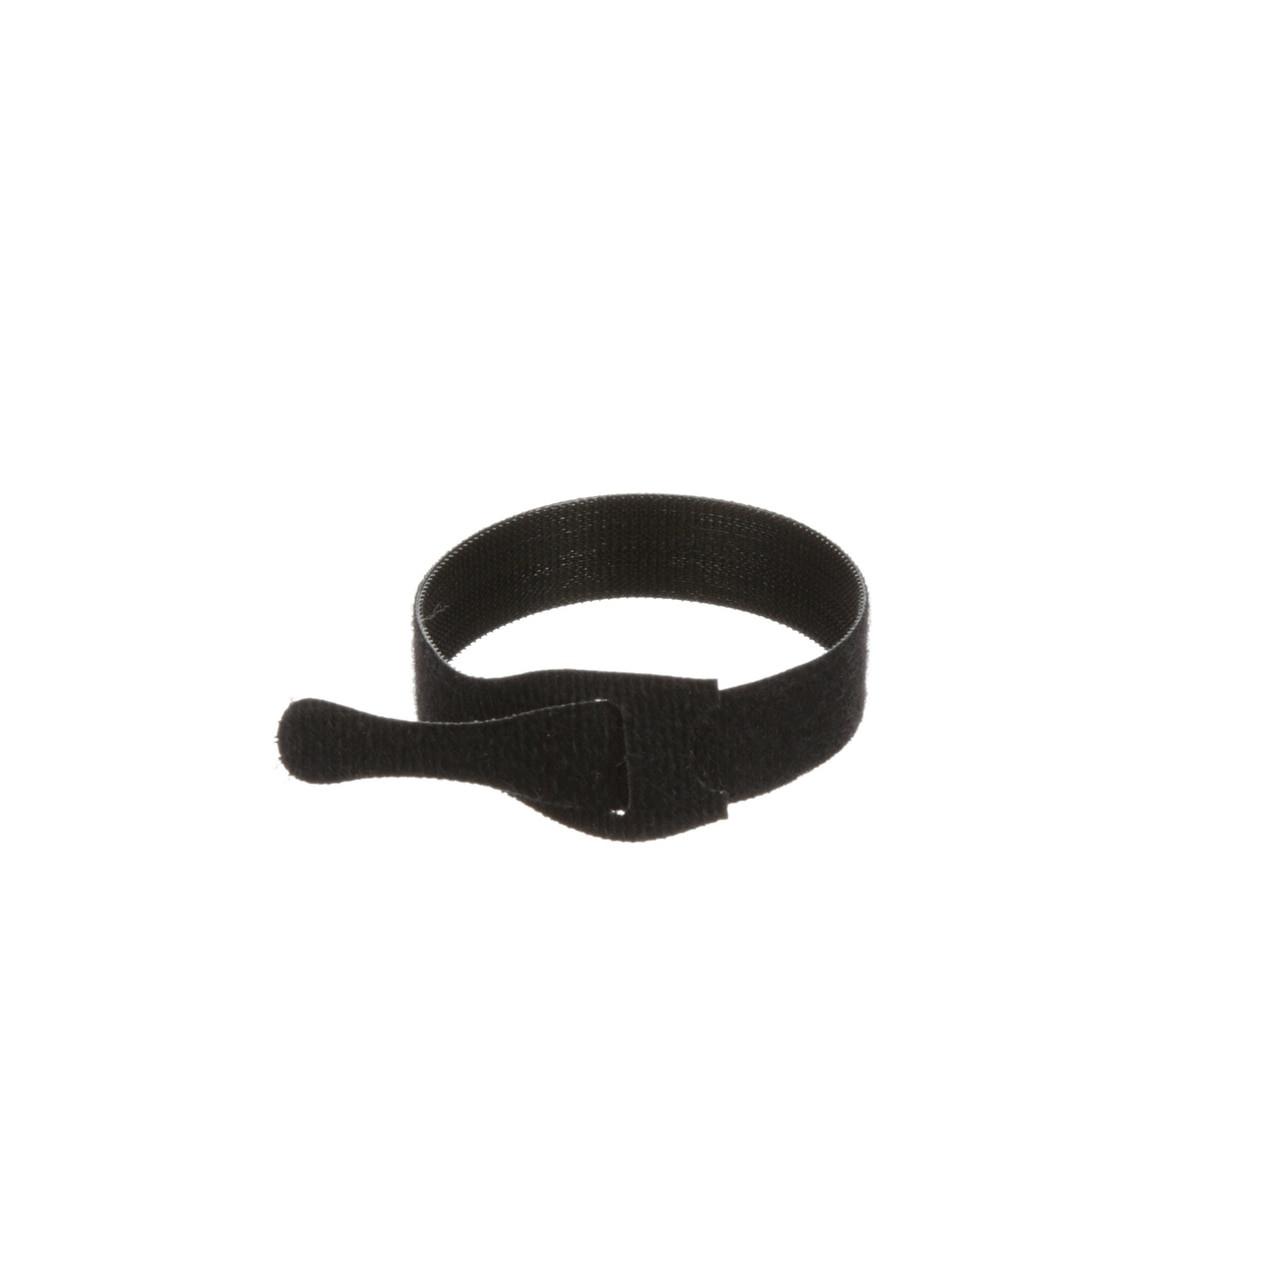 VELCRO® Brand QWIK Tie Die-Cut Straps / Velcro Straps - Bundling Straps - Velcro Tie - Velcro Strap